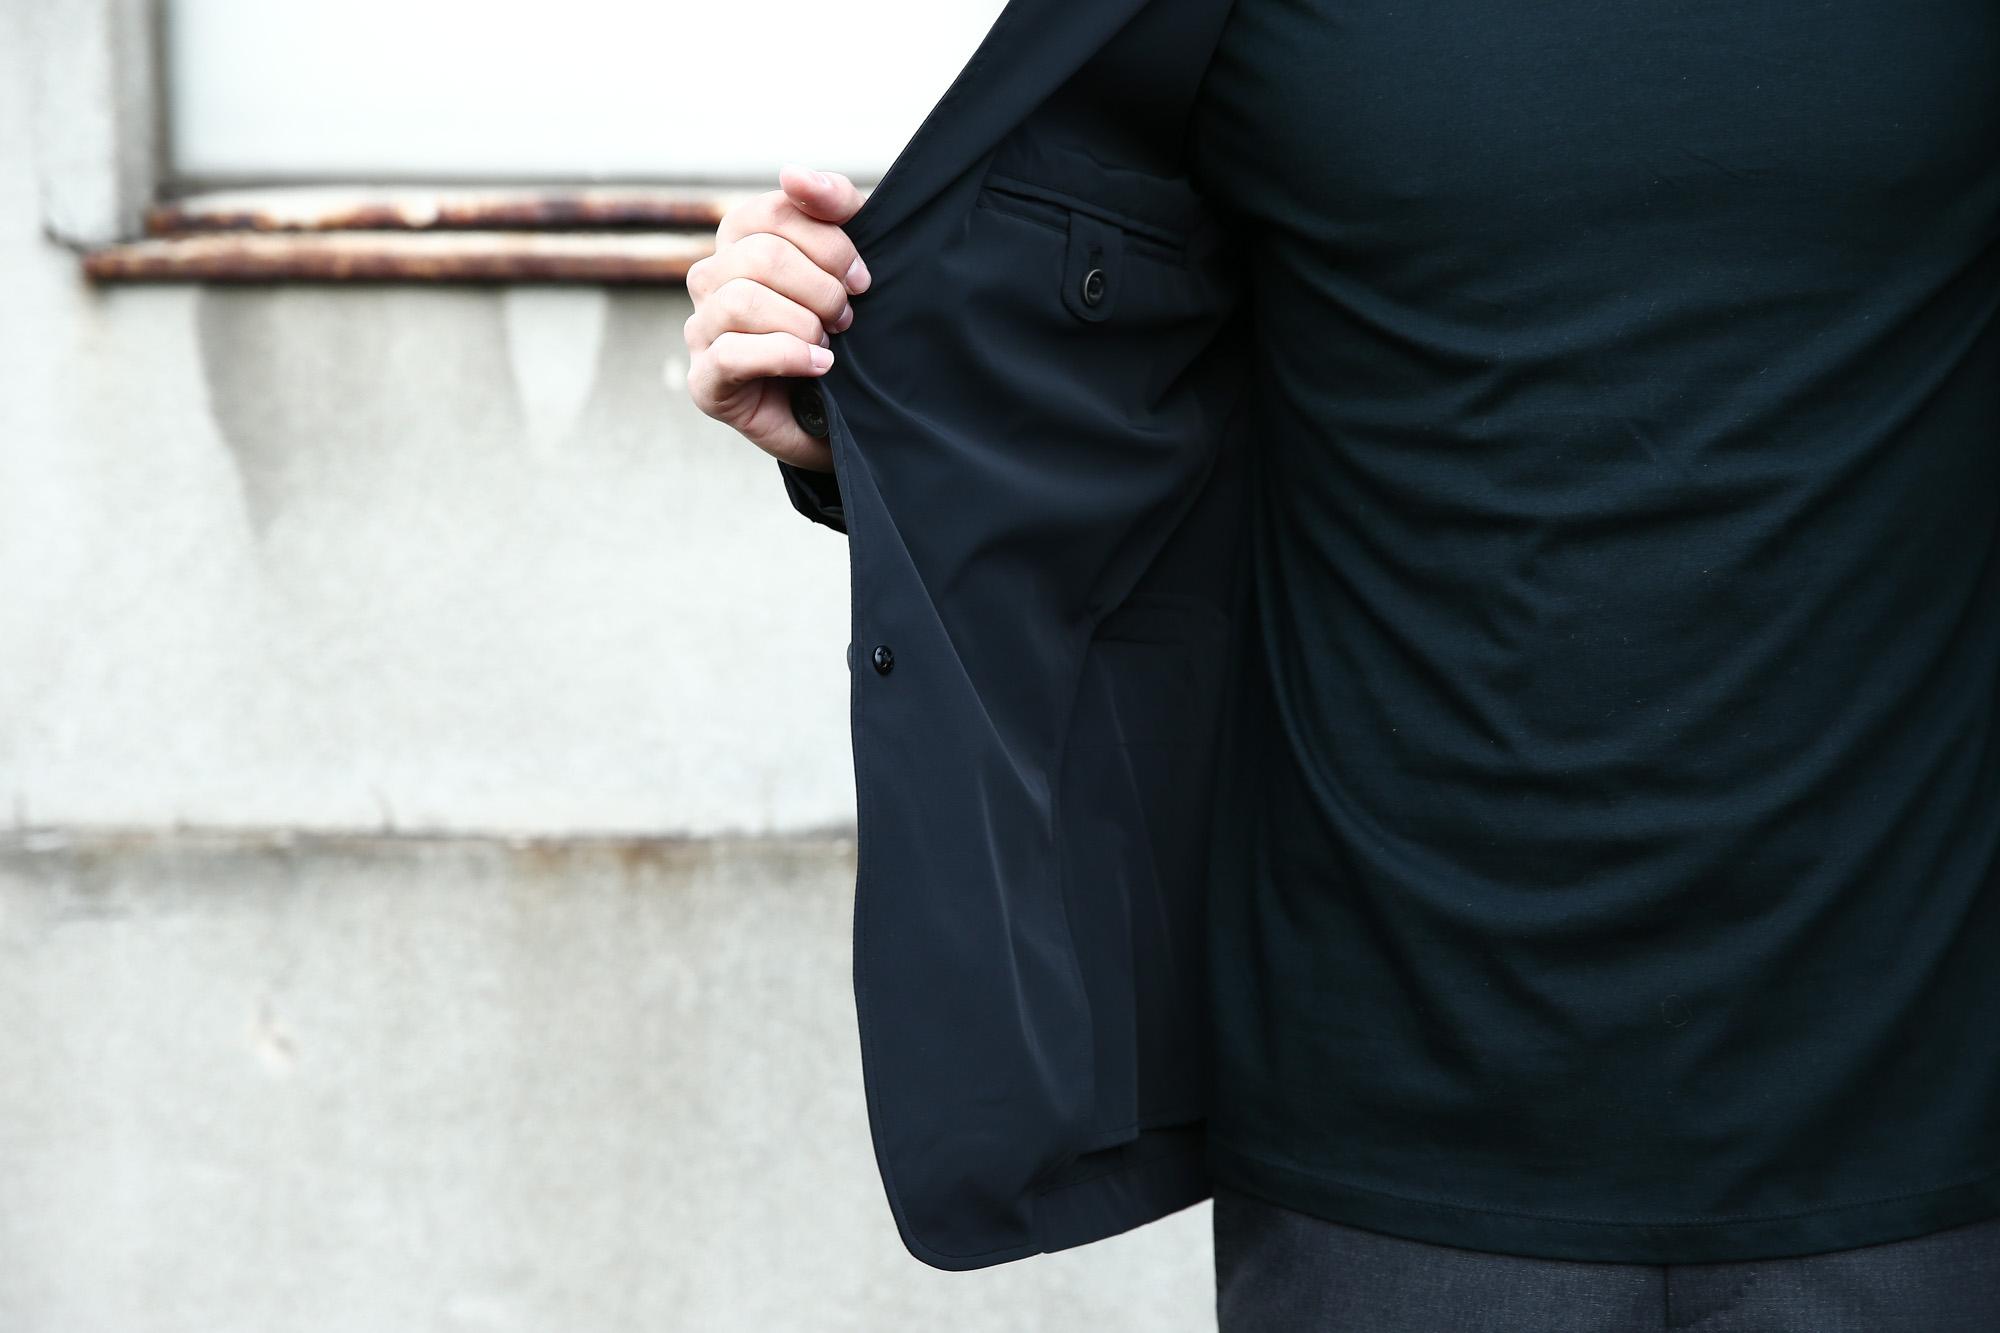 【HERNO / ヘルノ】 GA0069U Stretch Nylon Jacket (ストレッチ ナイロン ジャケット) 撥水ナイロン 2Bジャケット BLACK (ブラック・9300) Made in italy (イタリア製) 2018 春夏新作  愛知 名古屋 ZODIAC ゾディアック 42,44,46,48,50,52,54